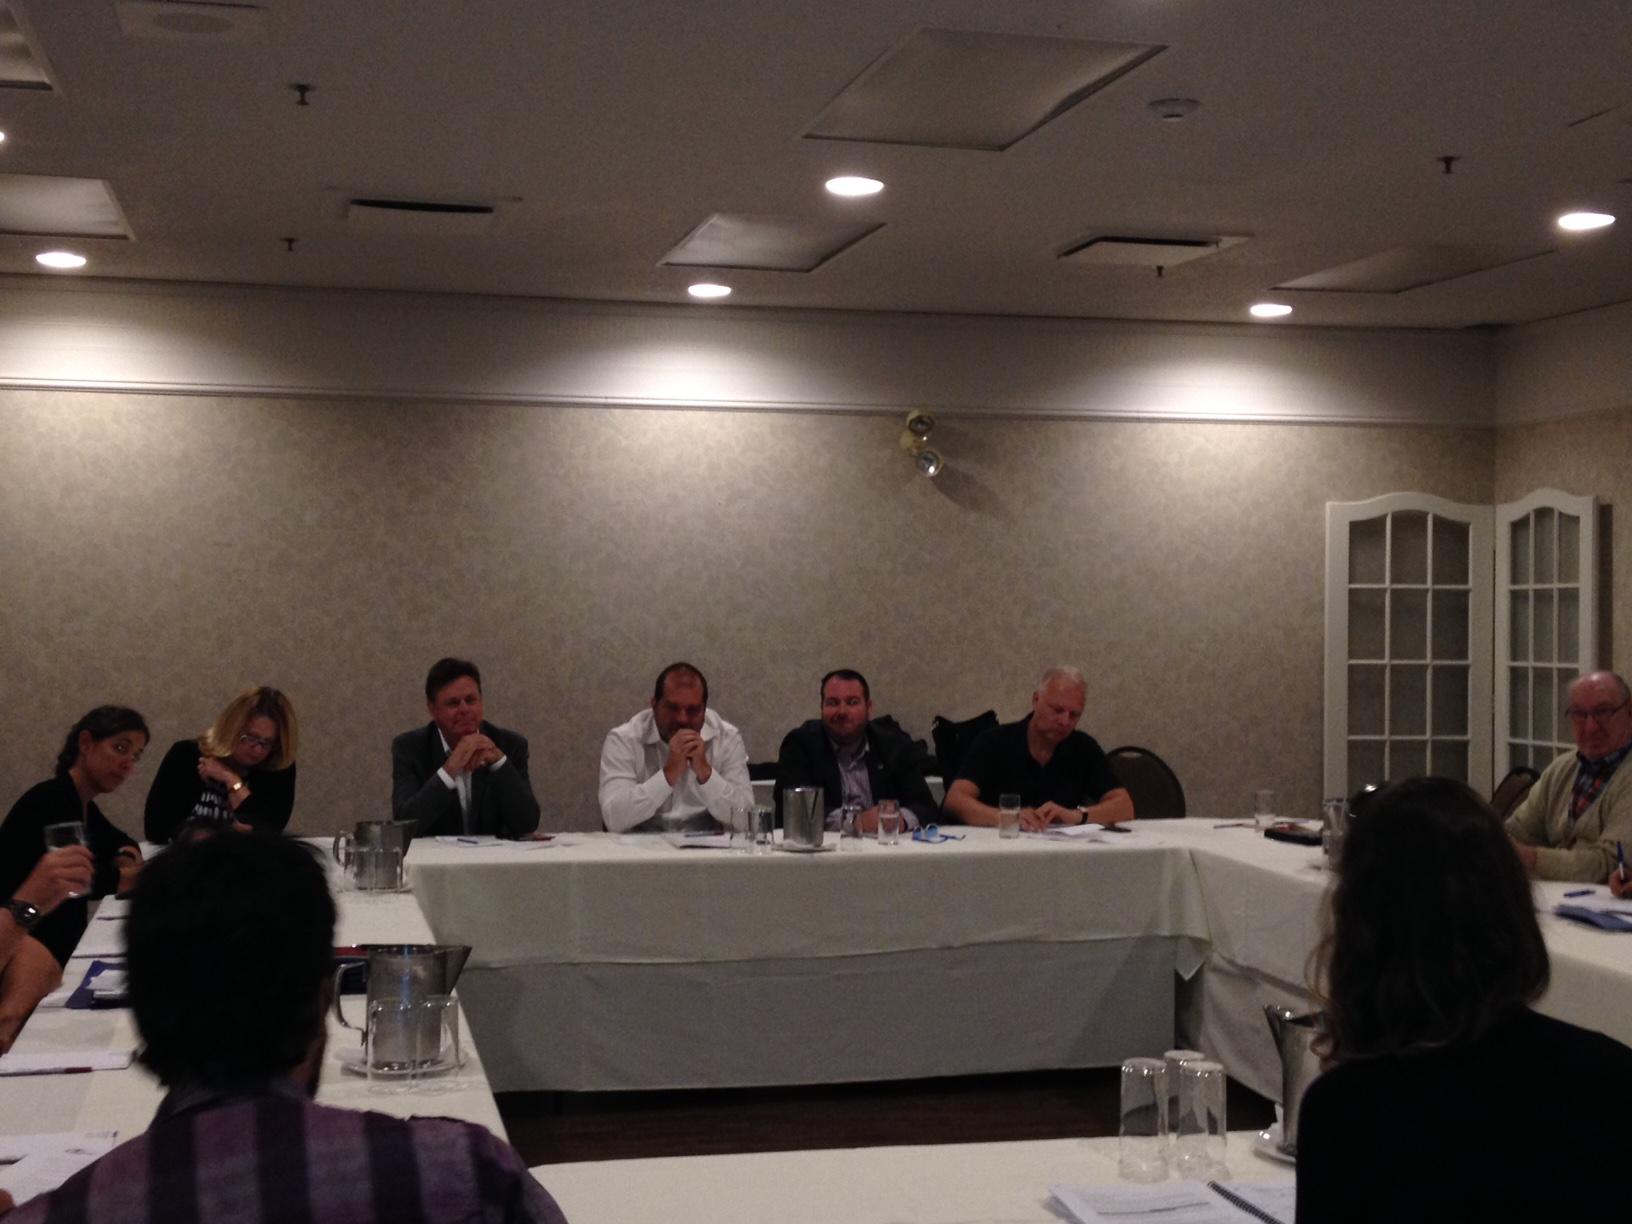 2015-08-26 rencontre gr communautaires 2